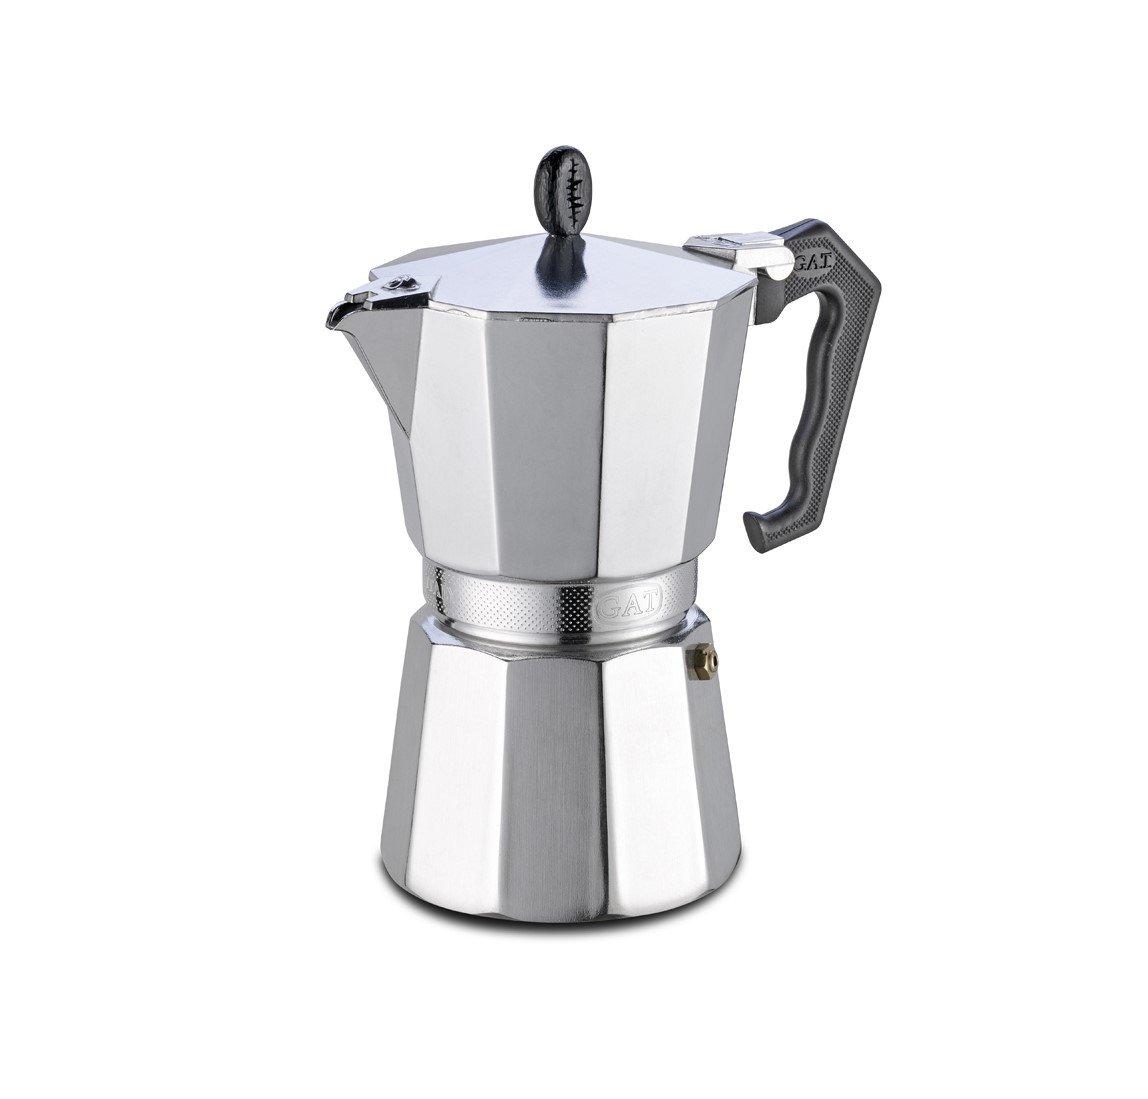 GAT Stove-Top Moka Espresso Italian-Made Coffee Maker Pot - 3 Cup G.A.T. 103203